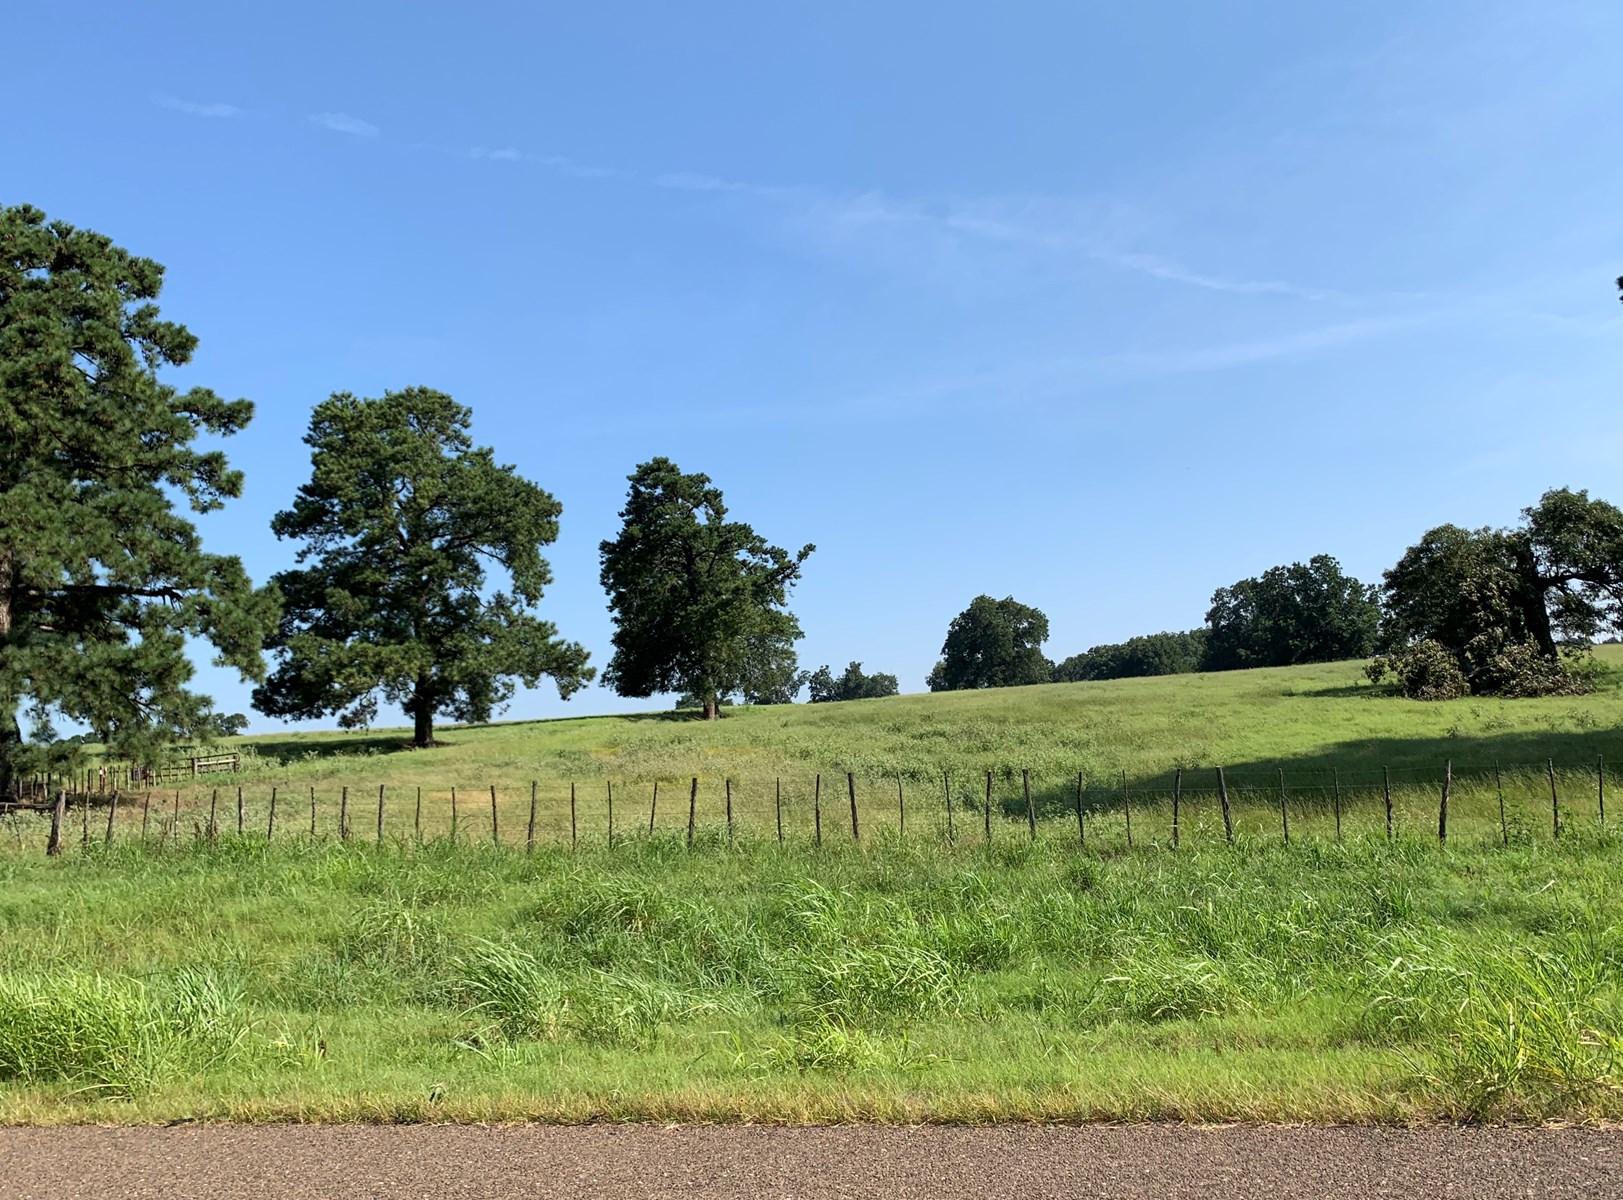 TX ranch for sale hilltop views